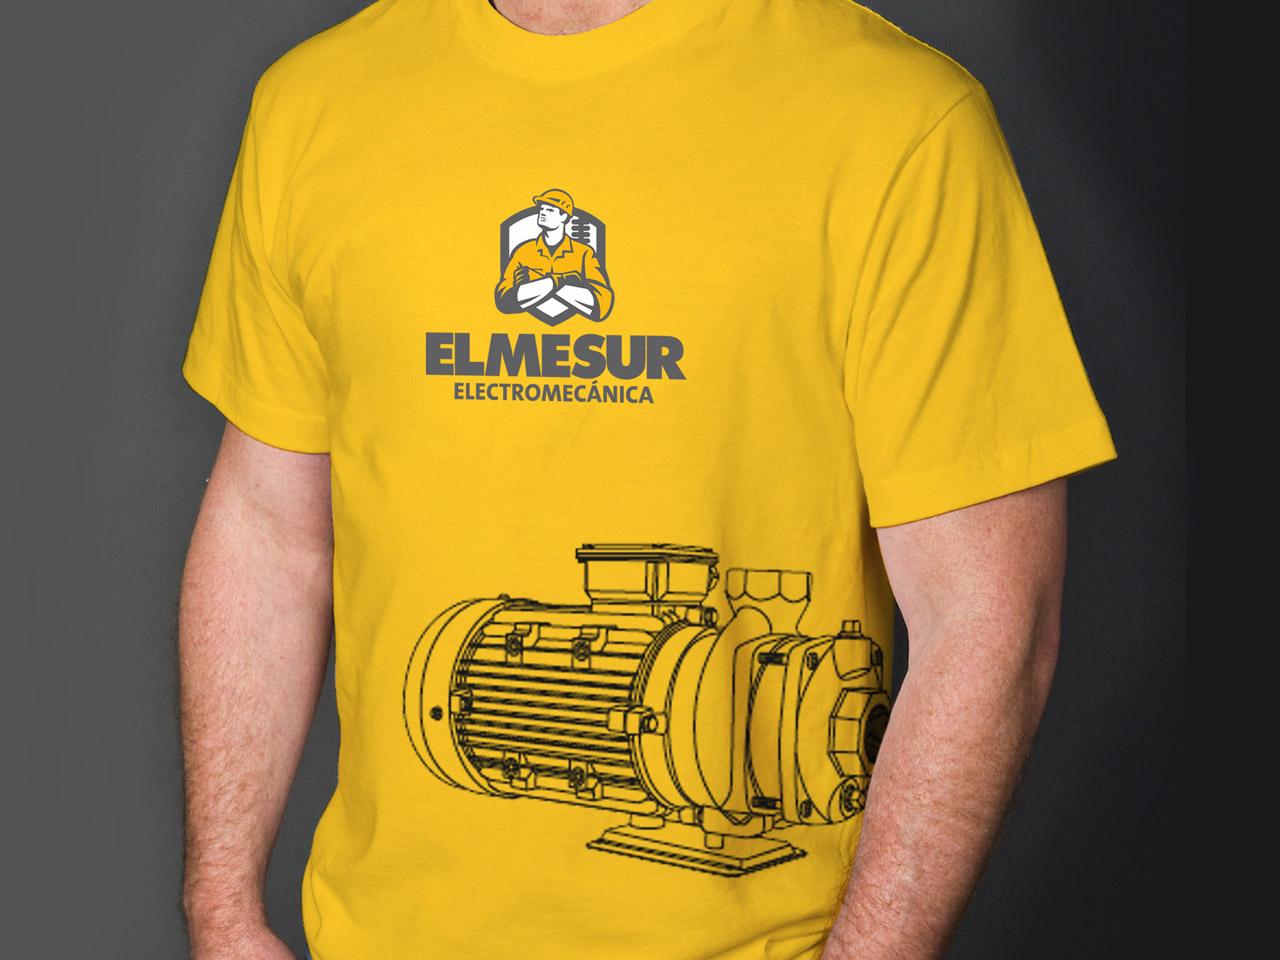 elmesur_t-shirt